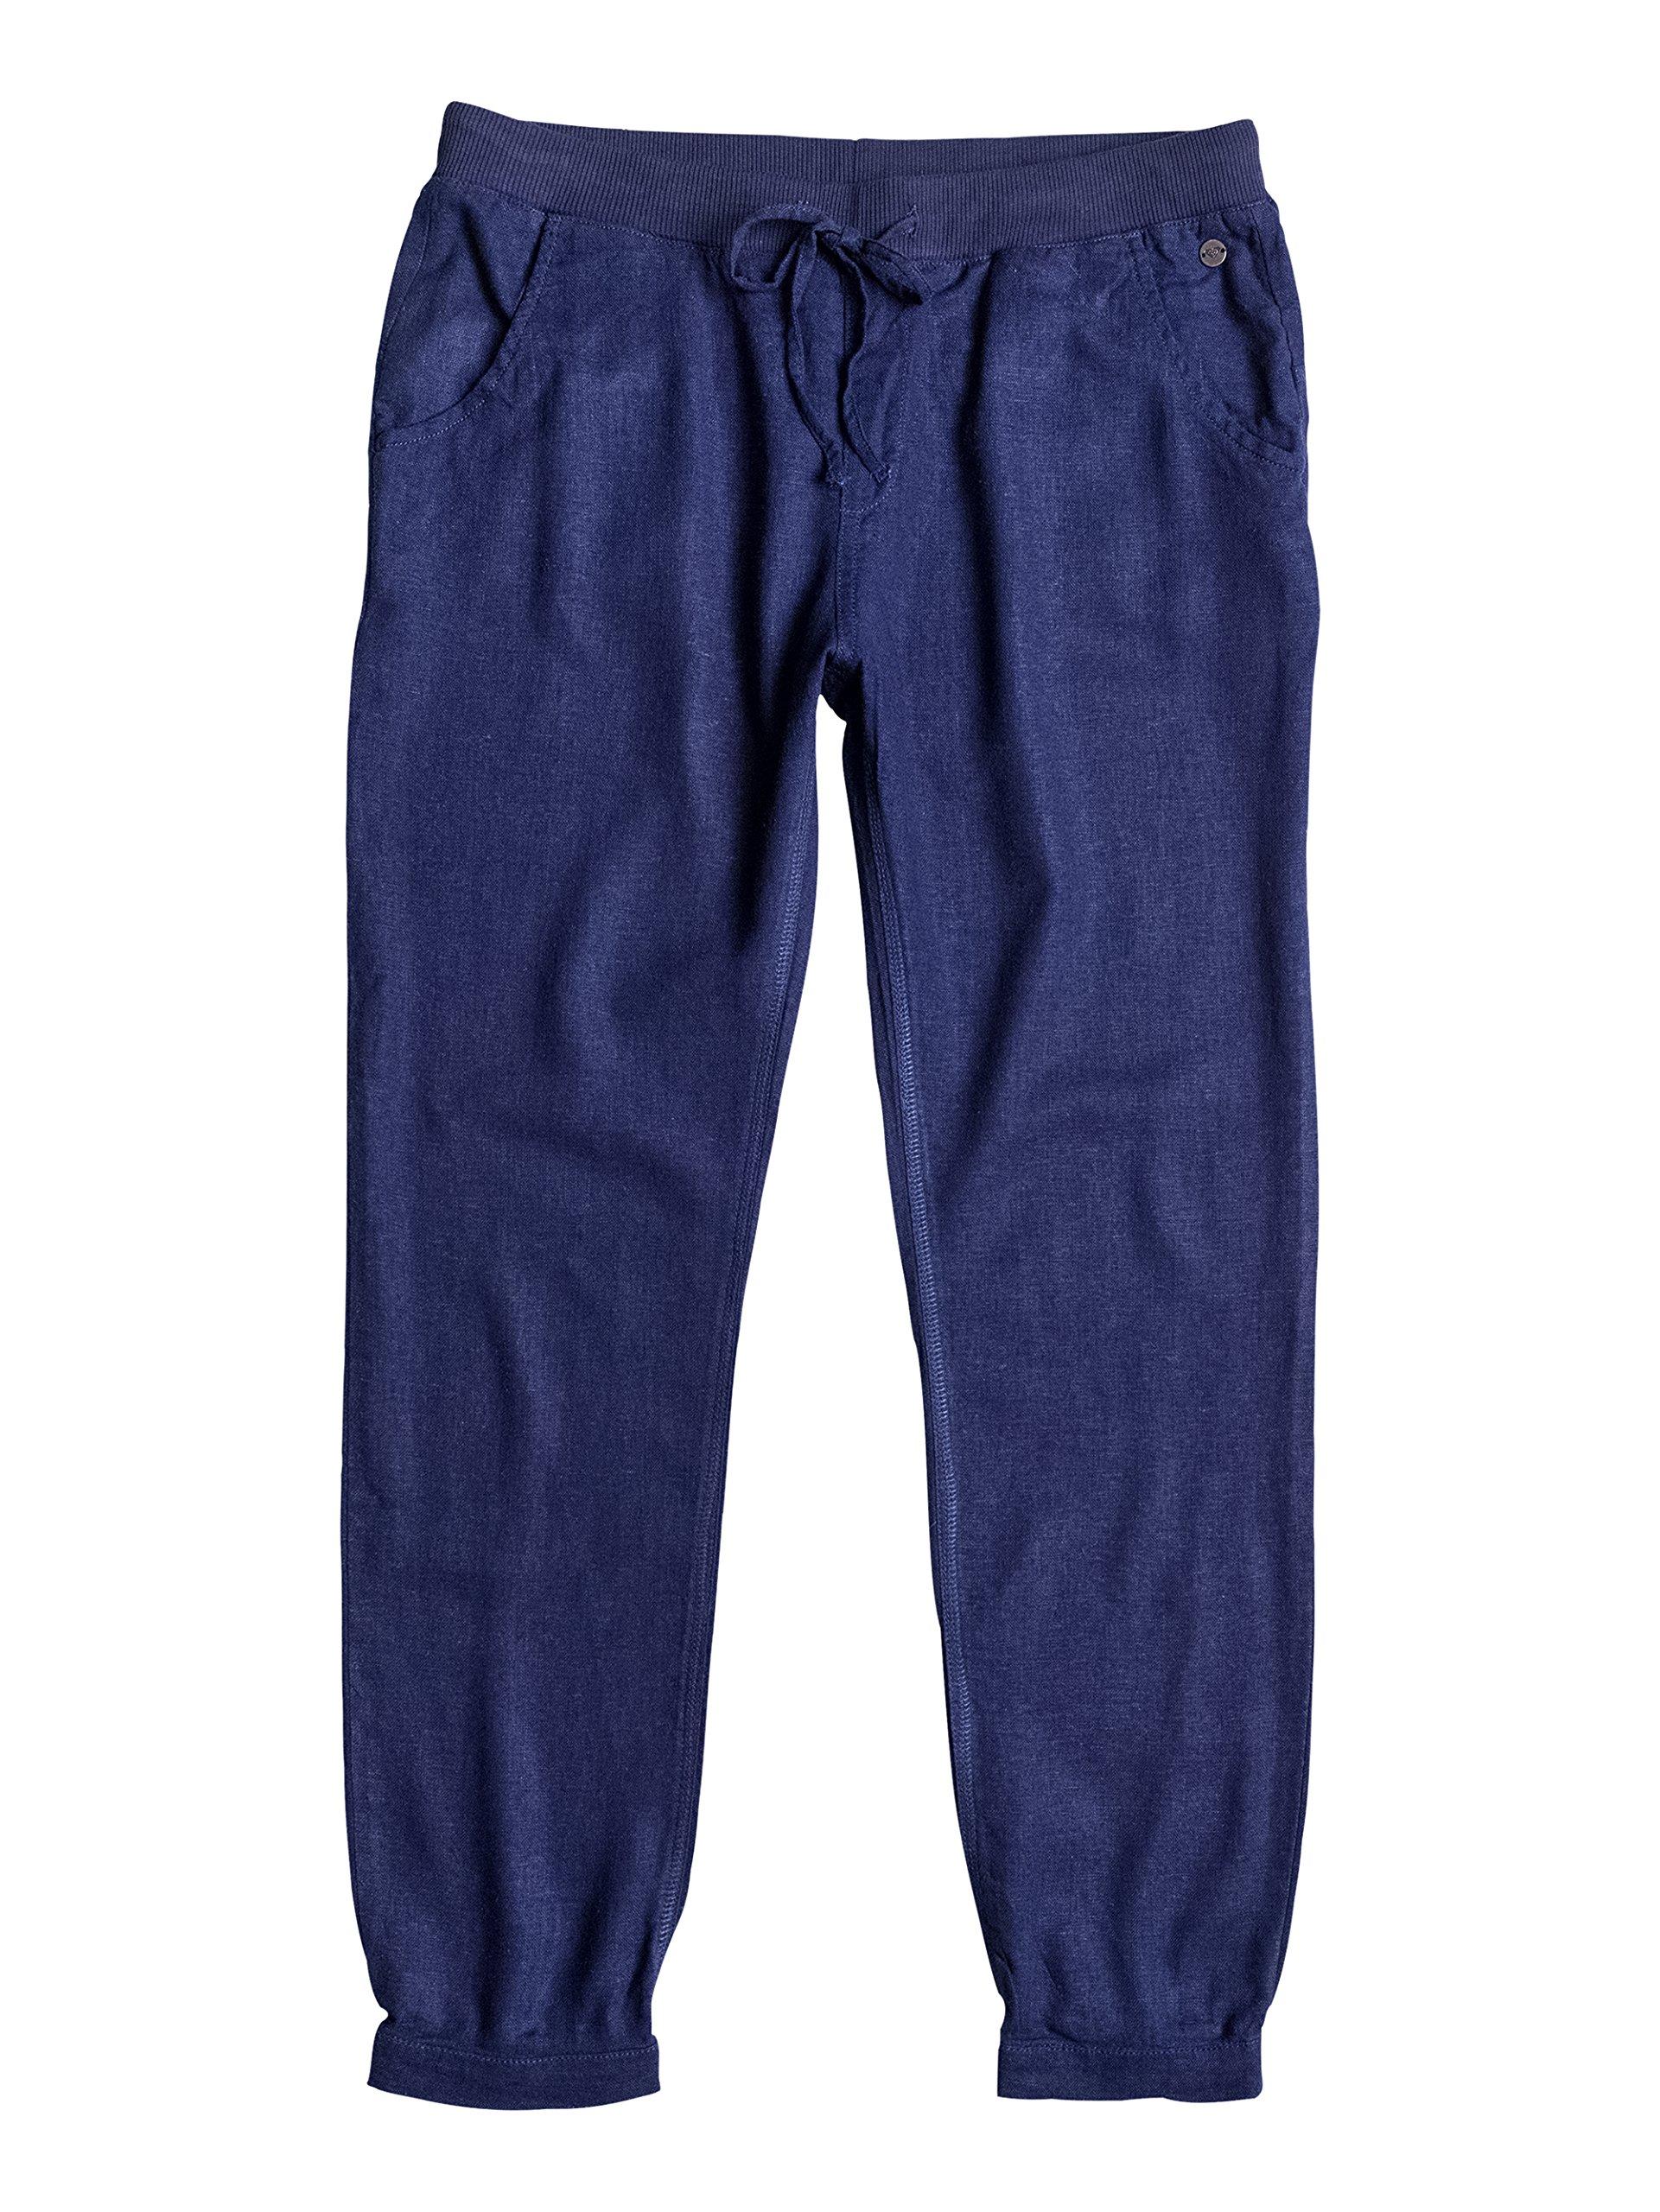 Roxy Silver J NDPT BTC0 – Pantalones para Mujer, Color Azul